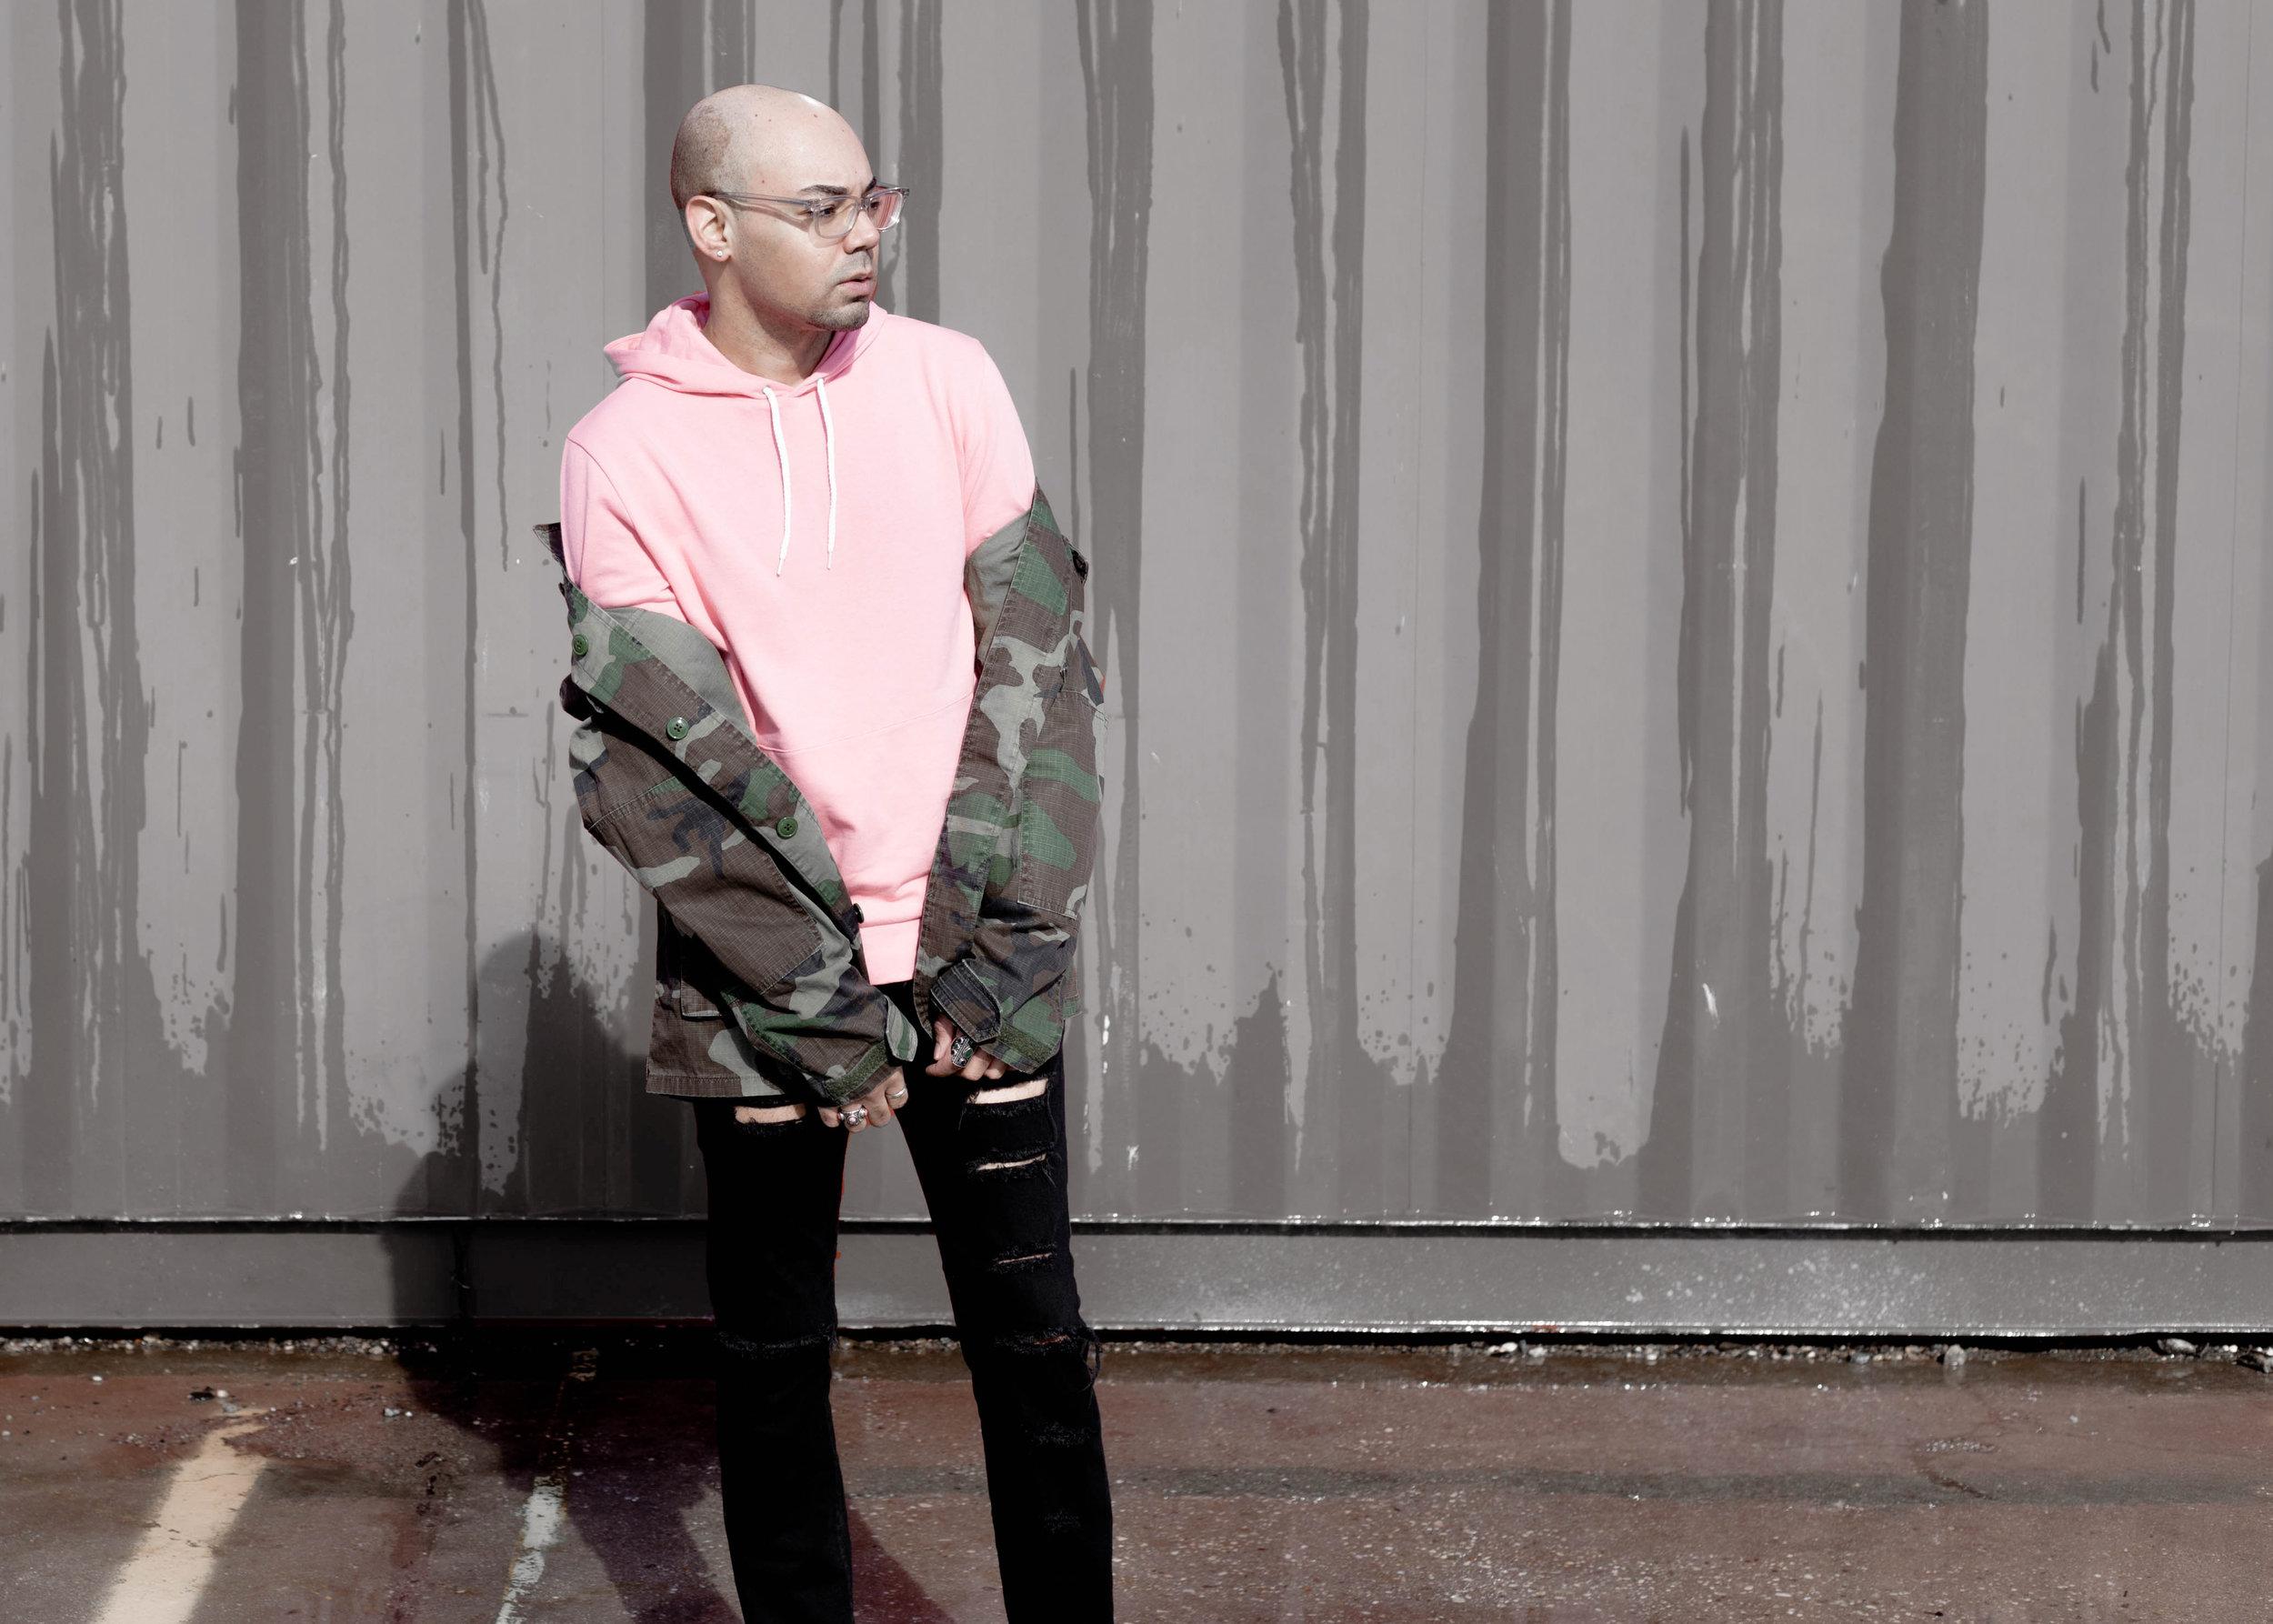 Camo Jacket + Pink Hoodie -